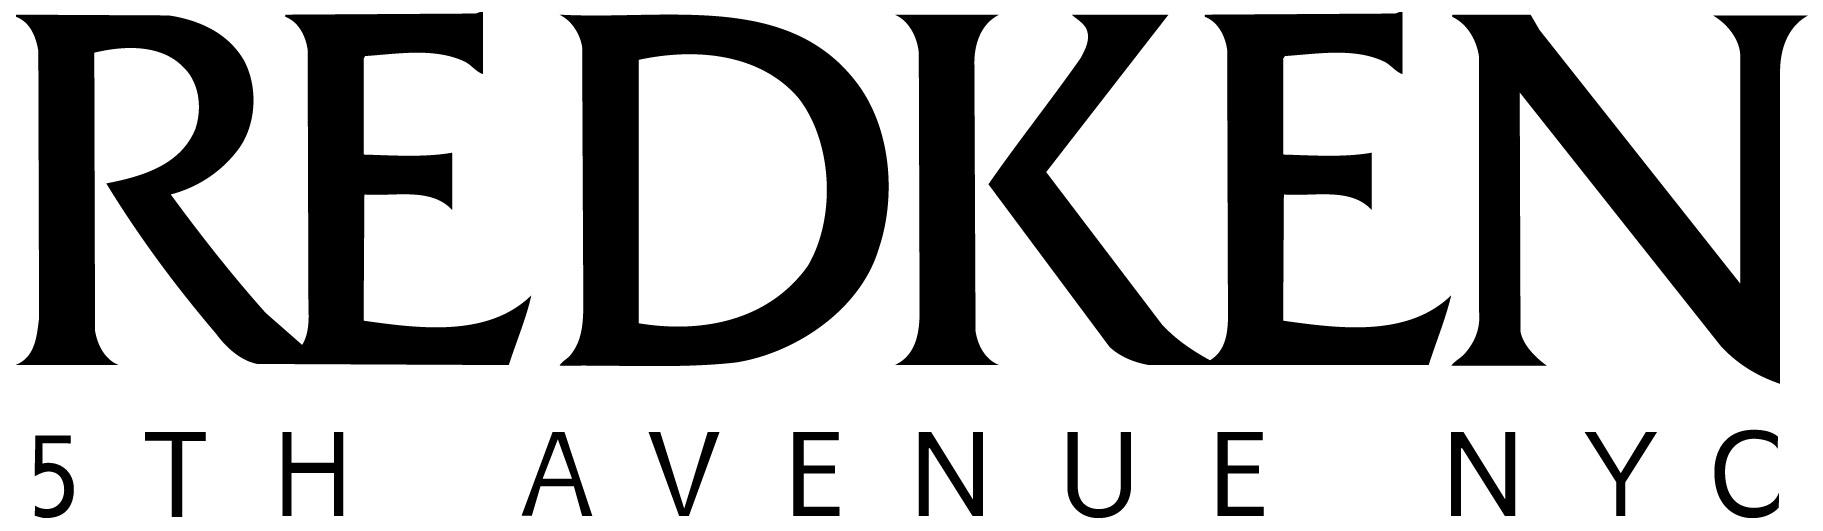 fichier redken 5th avenue nyc logo jpg wikip dia rh fr wikipedia org redken logo font redken white logo